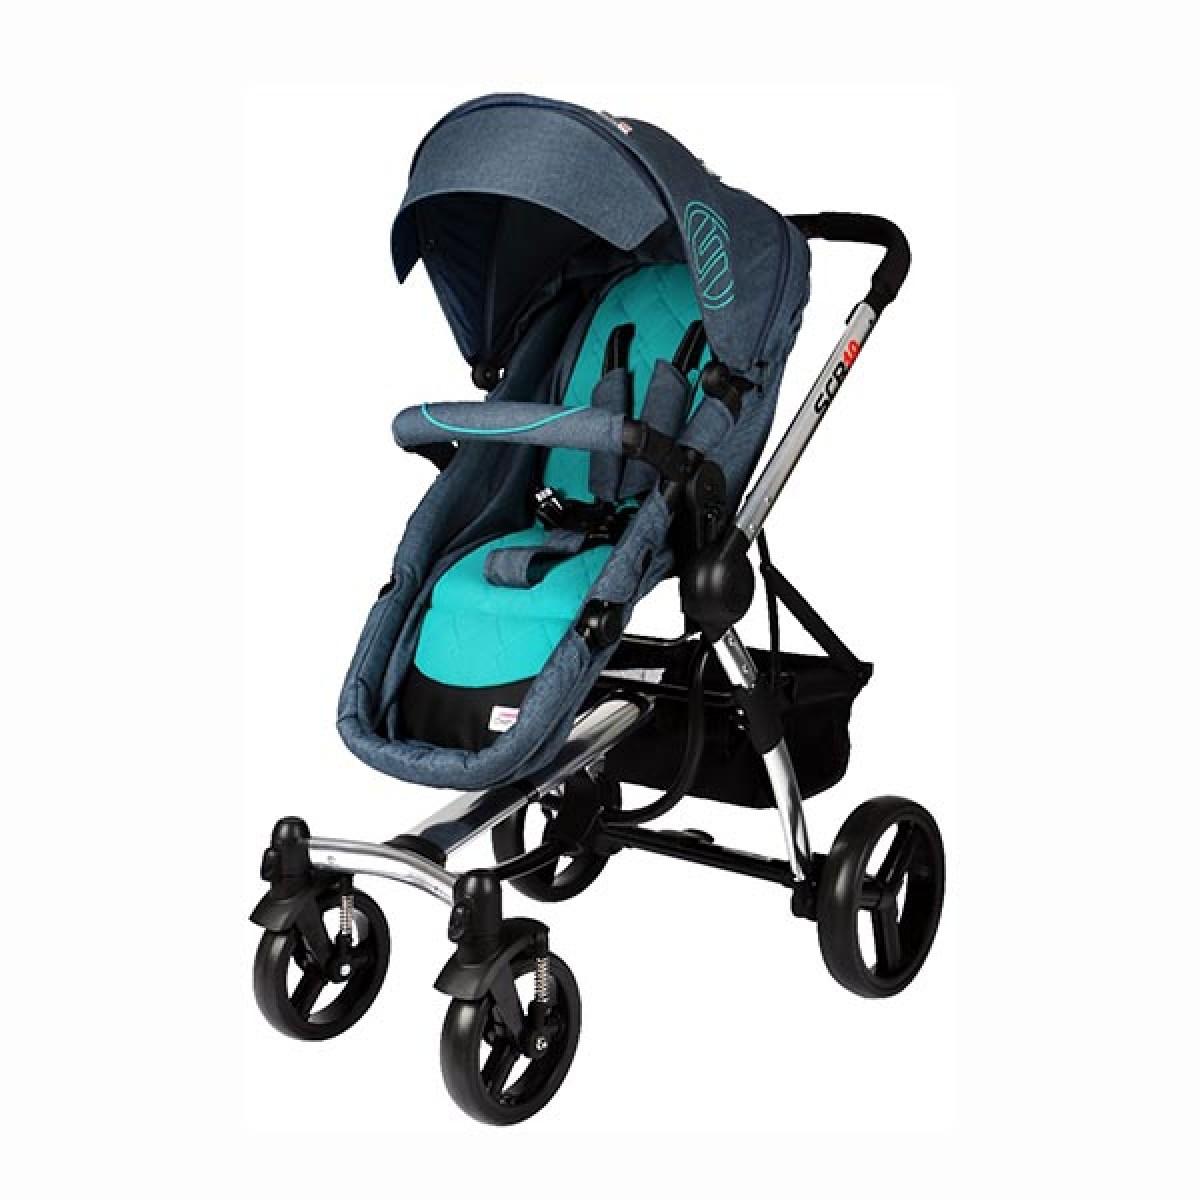 Scr 10 Stroller - Kico Baby Center